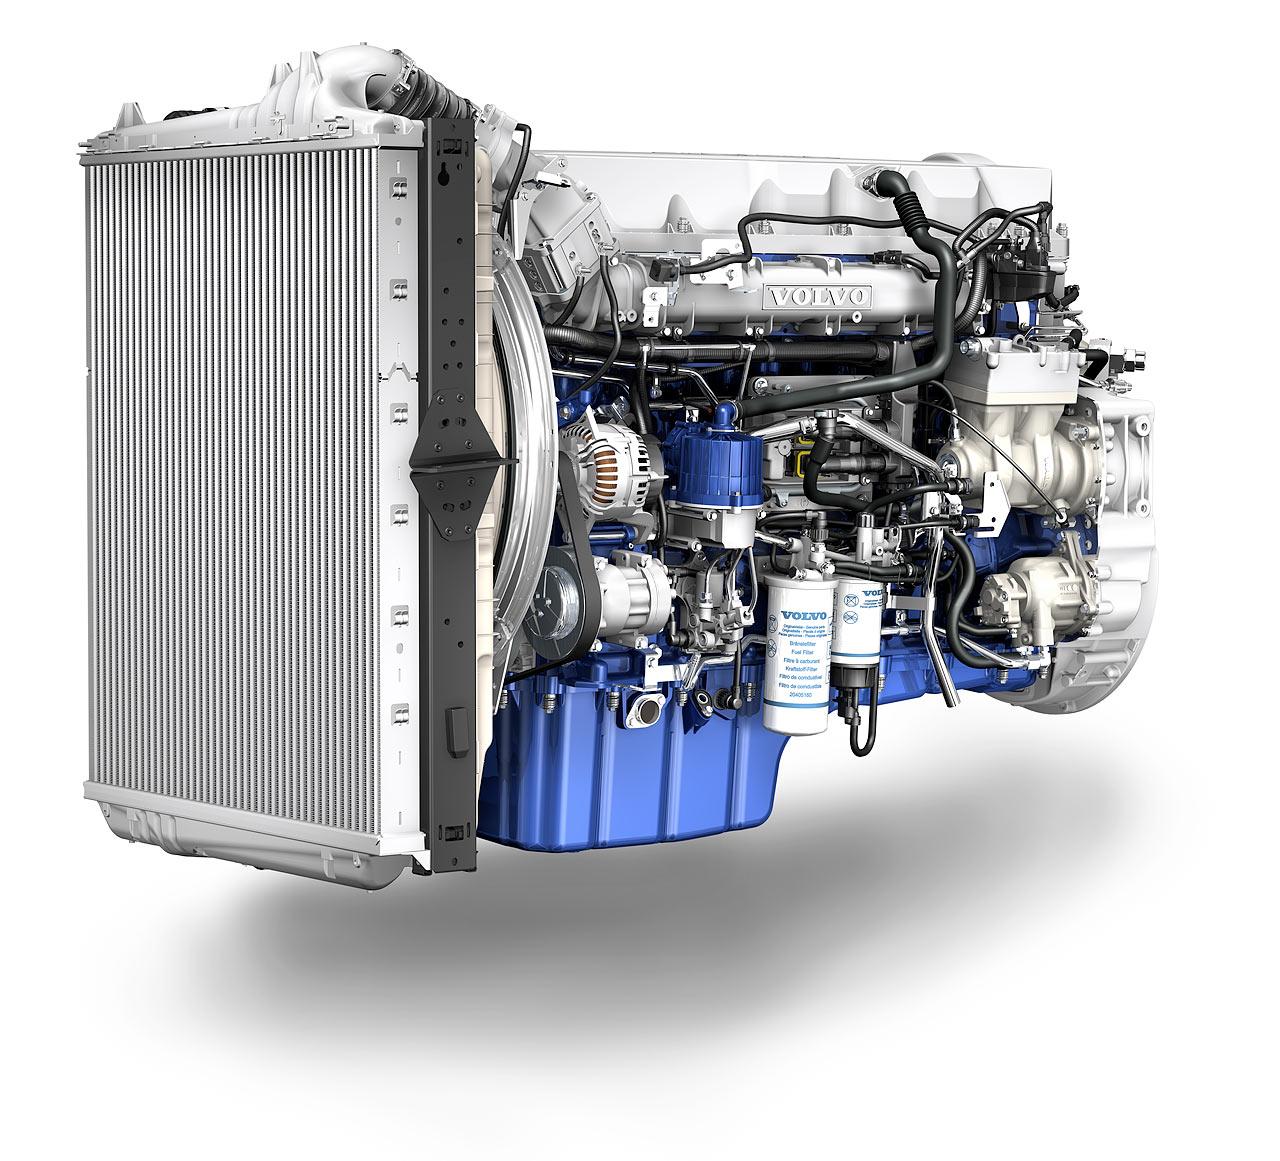 article ips engine penta volvo expansion range to image volvopenta supply for developed superyachtnews design superyachts com